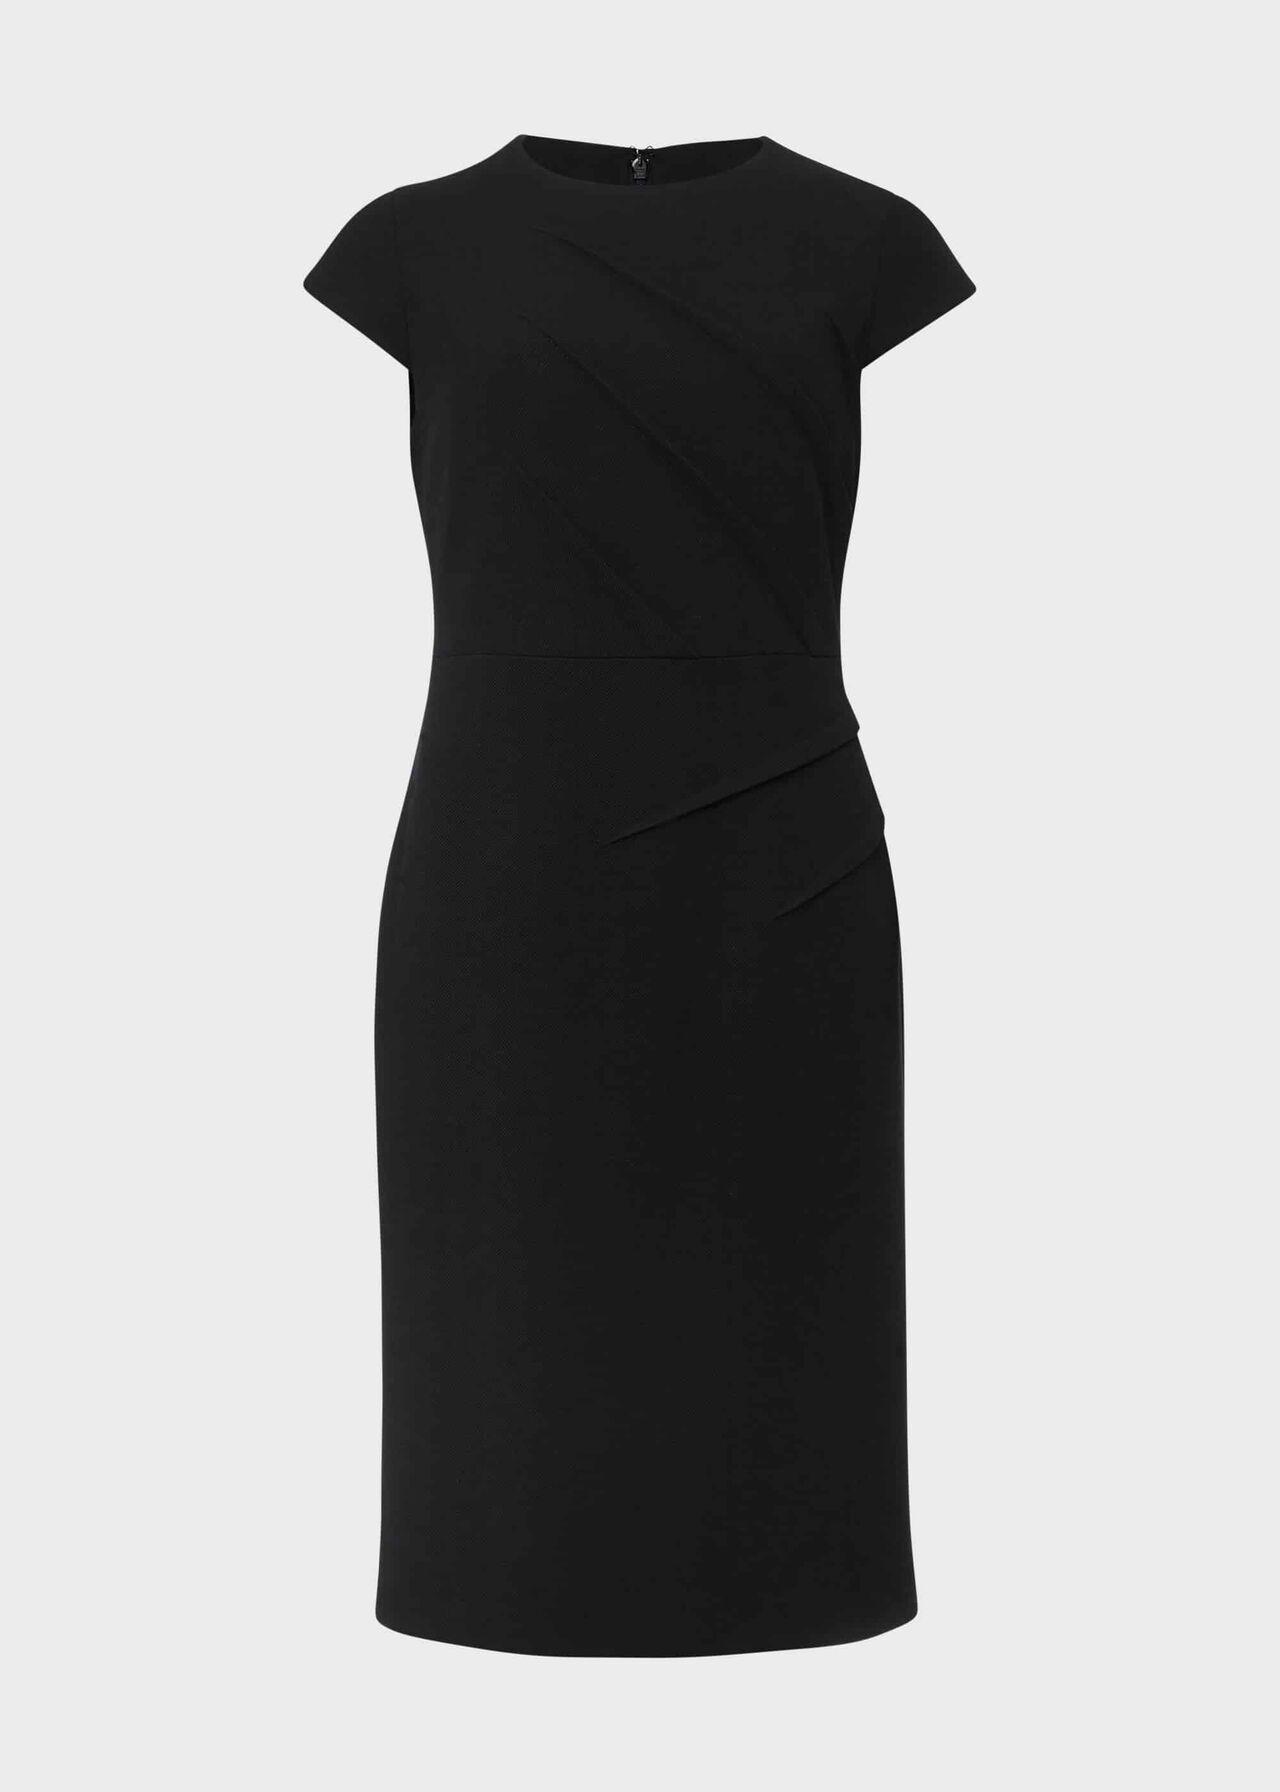 Ophelia Shift Dress Black